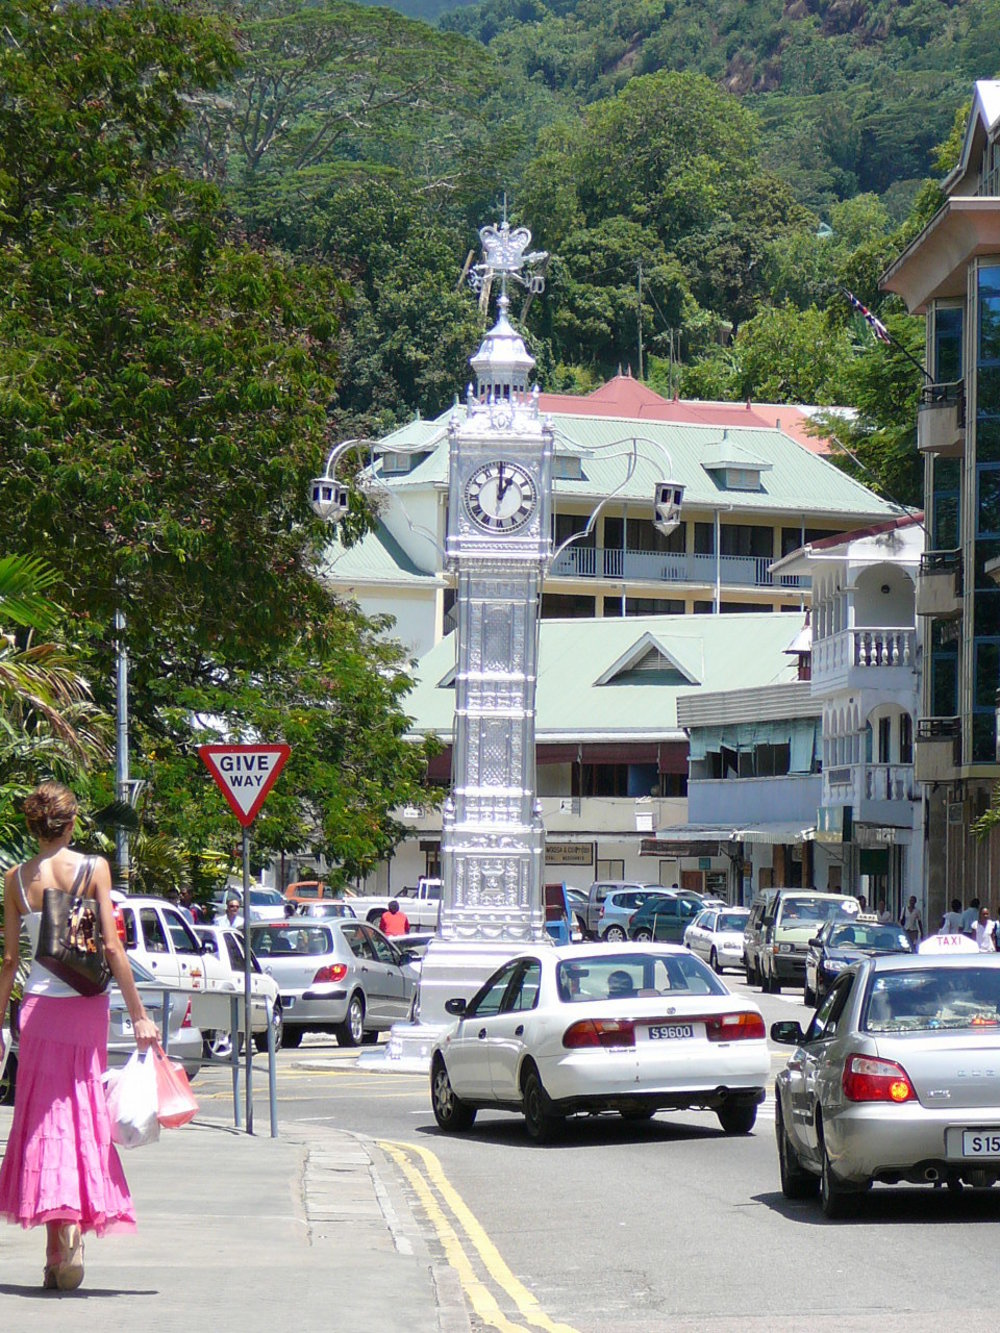 Clock tower and street scene Victoria Seychelles